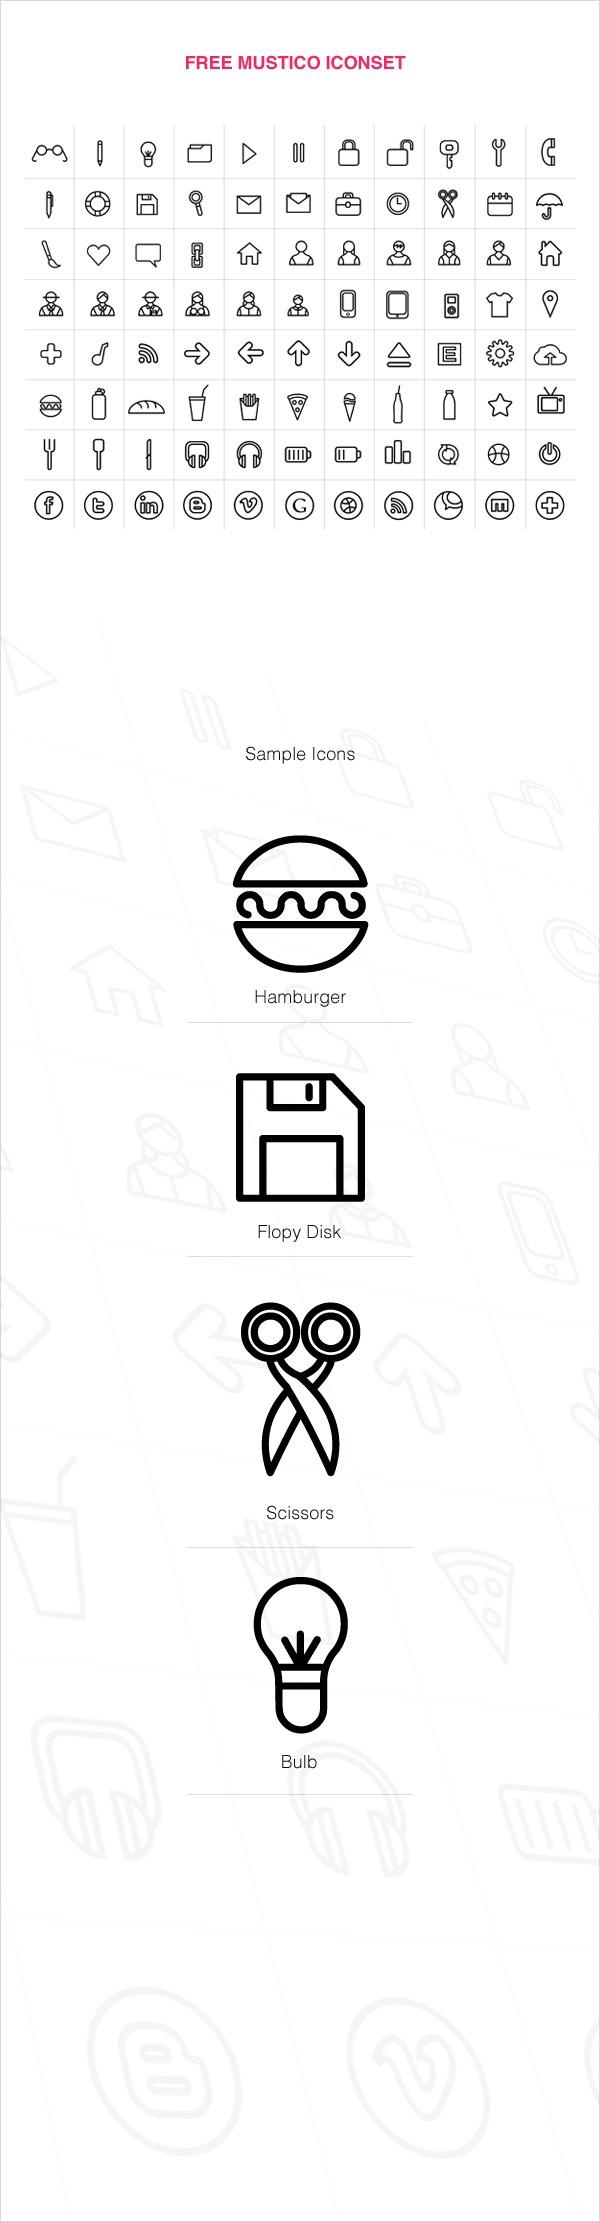 Free Mustico Iconset